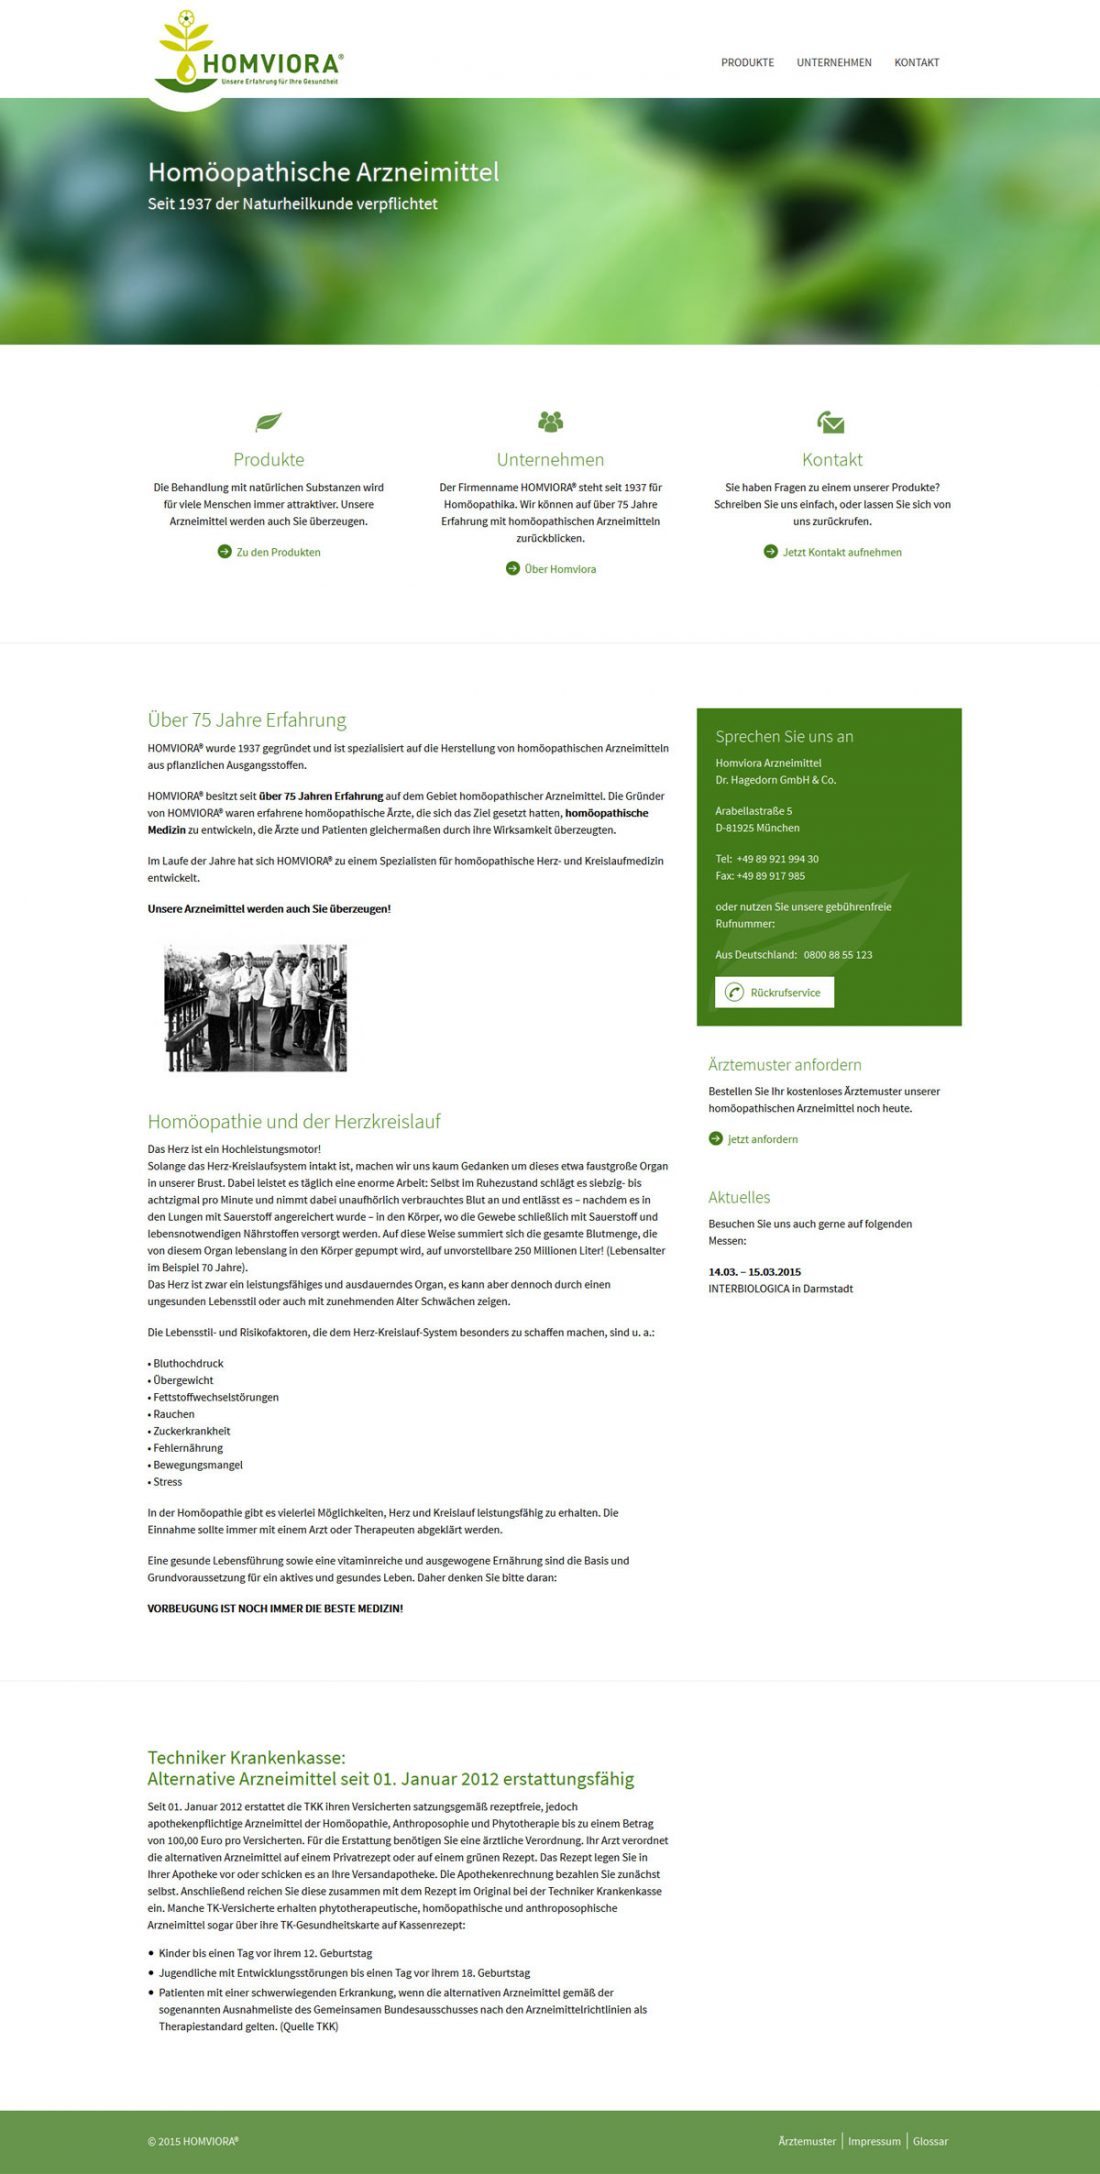 Screenshot Webseite Homviora